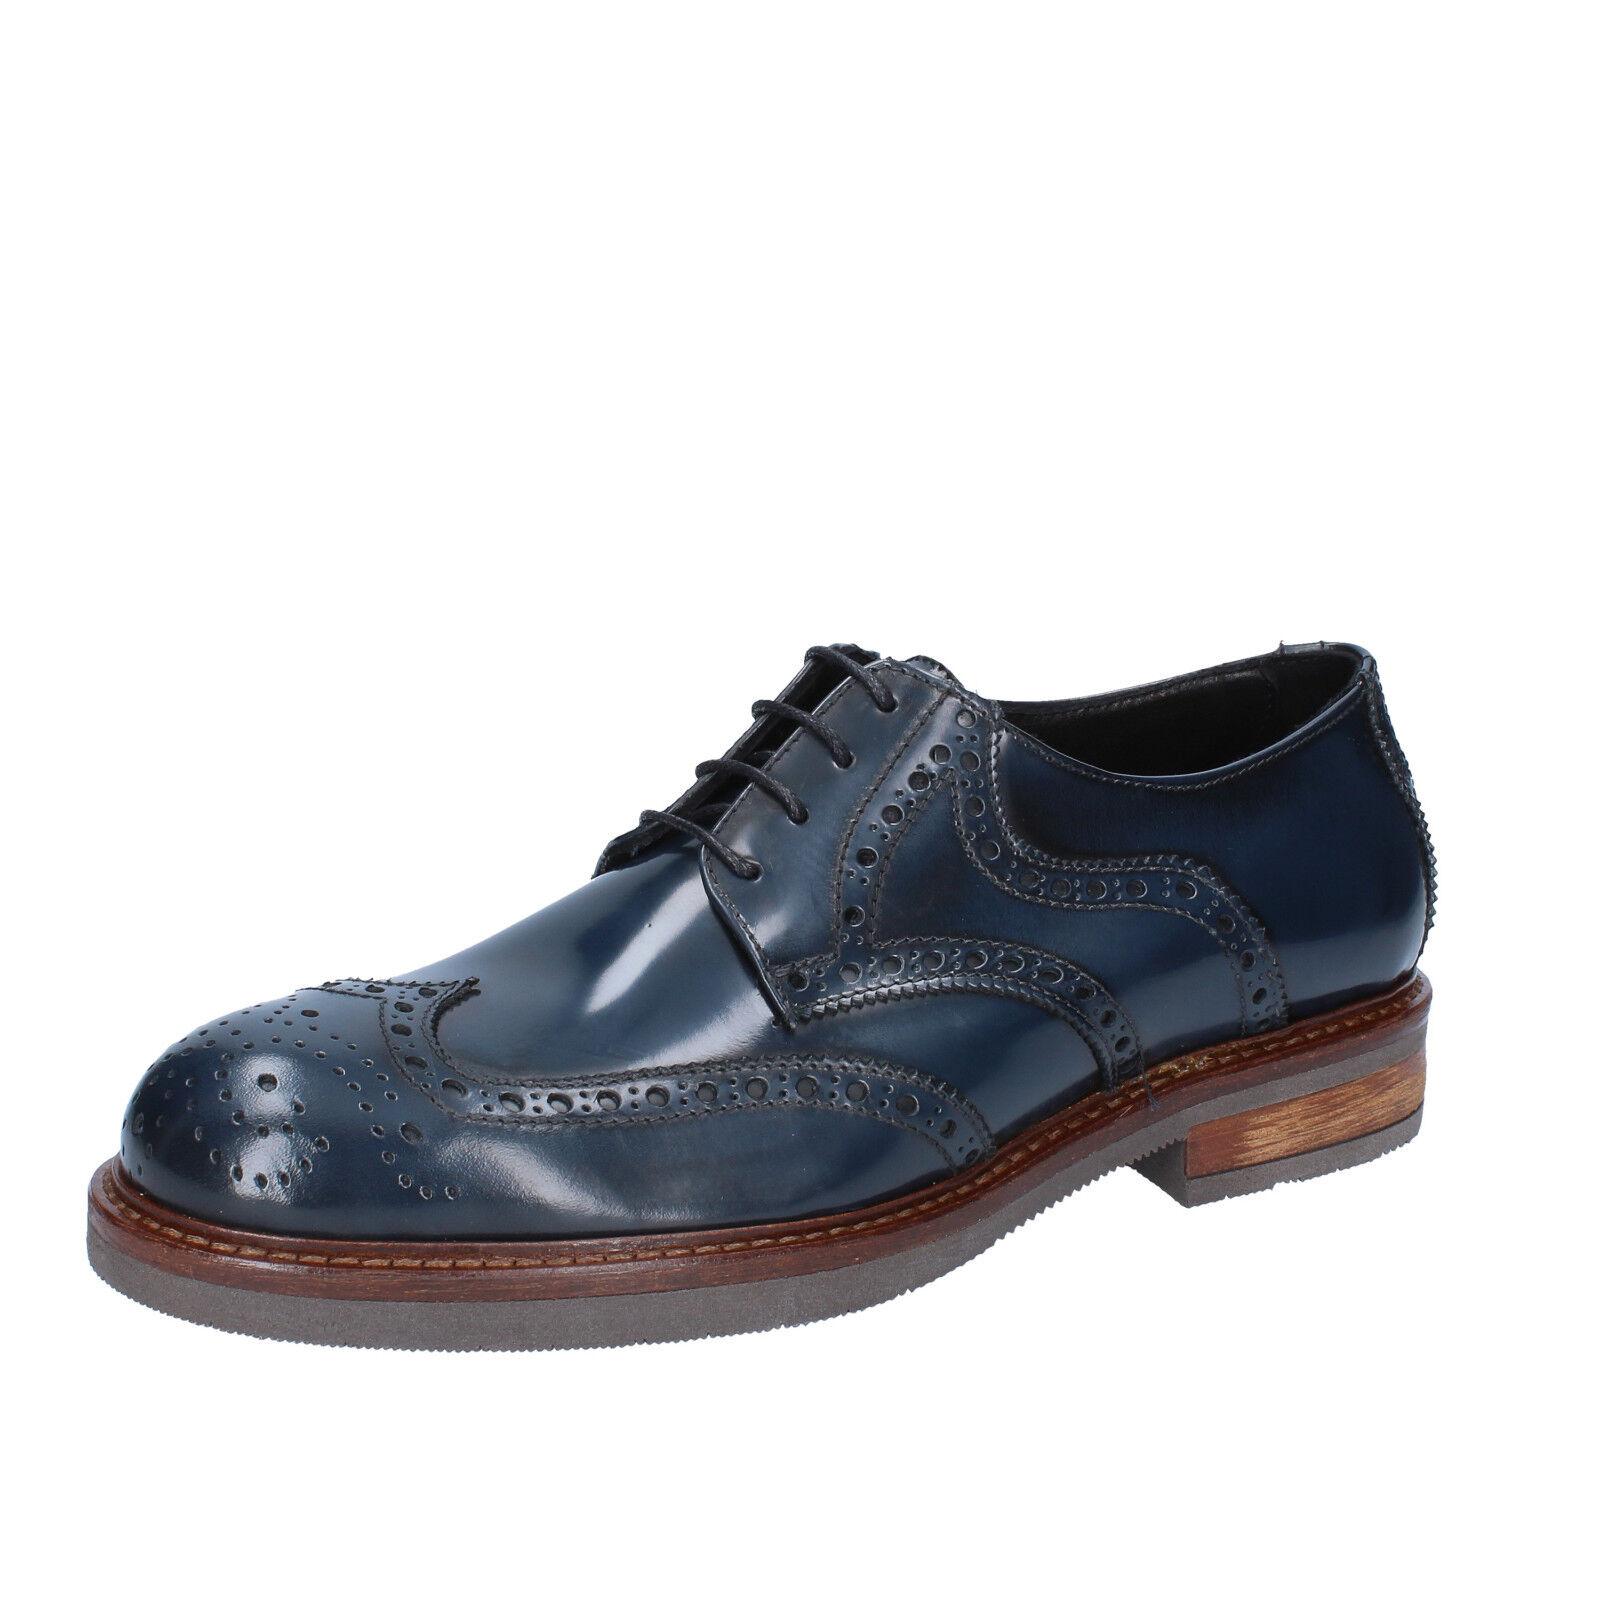 Kleidung & Accessoires One Six Five Brown Leather Wingtip Brogue Shoes Uk 8 Eu 42 Hohe QualitäT Und Geringer Aufwand Herrenschuhe